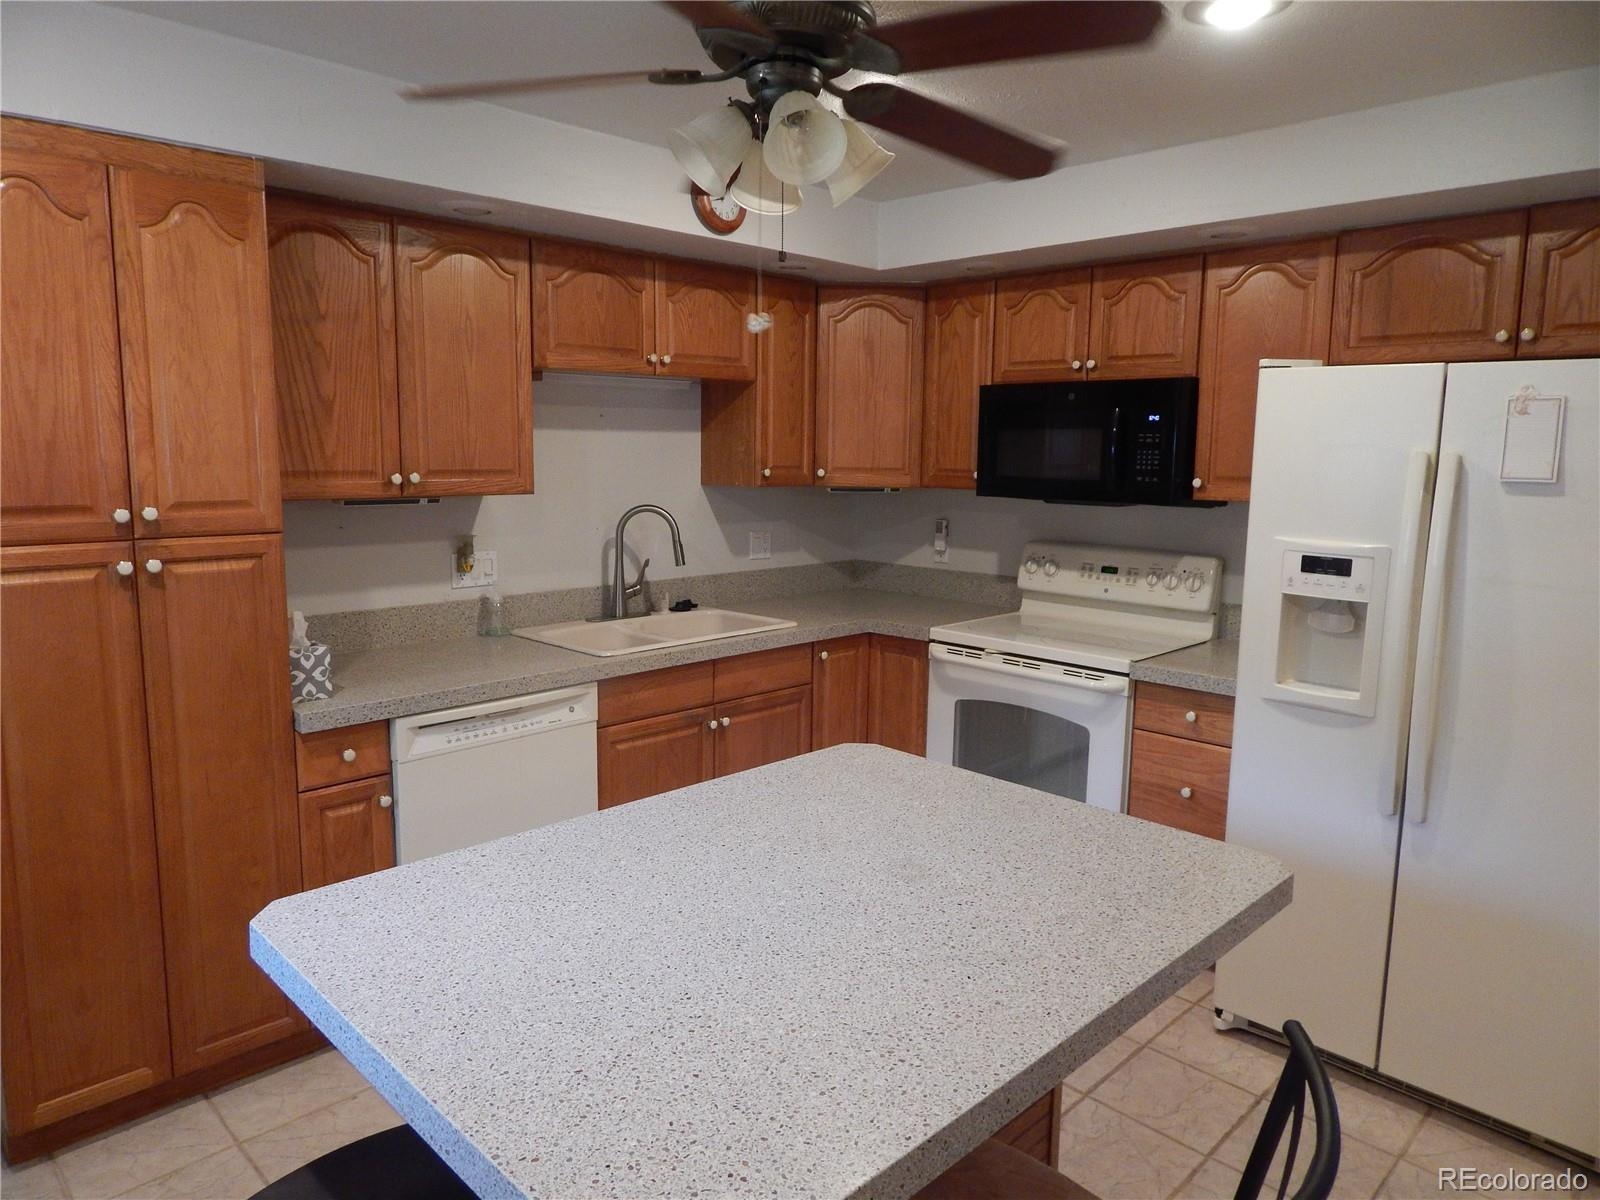 MLS# 8273867 - 4 - 2985 N Xenon Street, Wheat Ridge, CO 80215